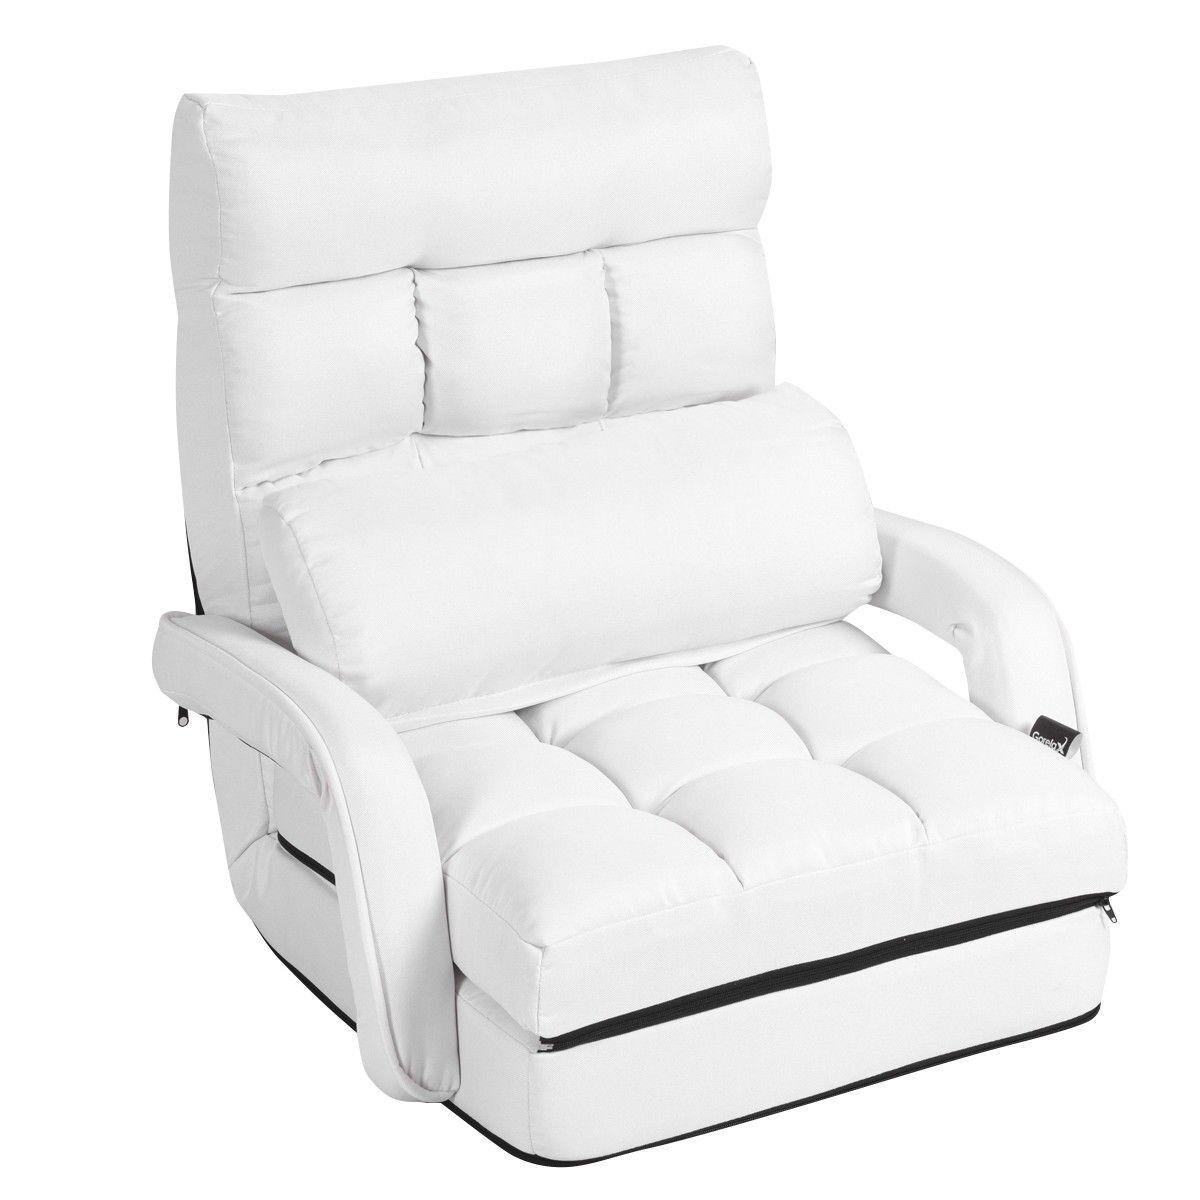 Costway Fauteuil Convertible Chauffeuse Convertible 1 Place en Tissu avec Oreiller 5 Positions Blanc